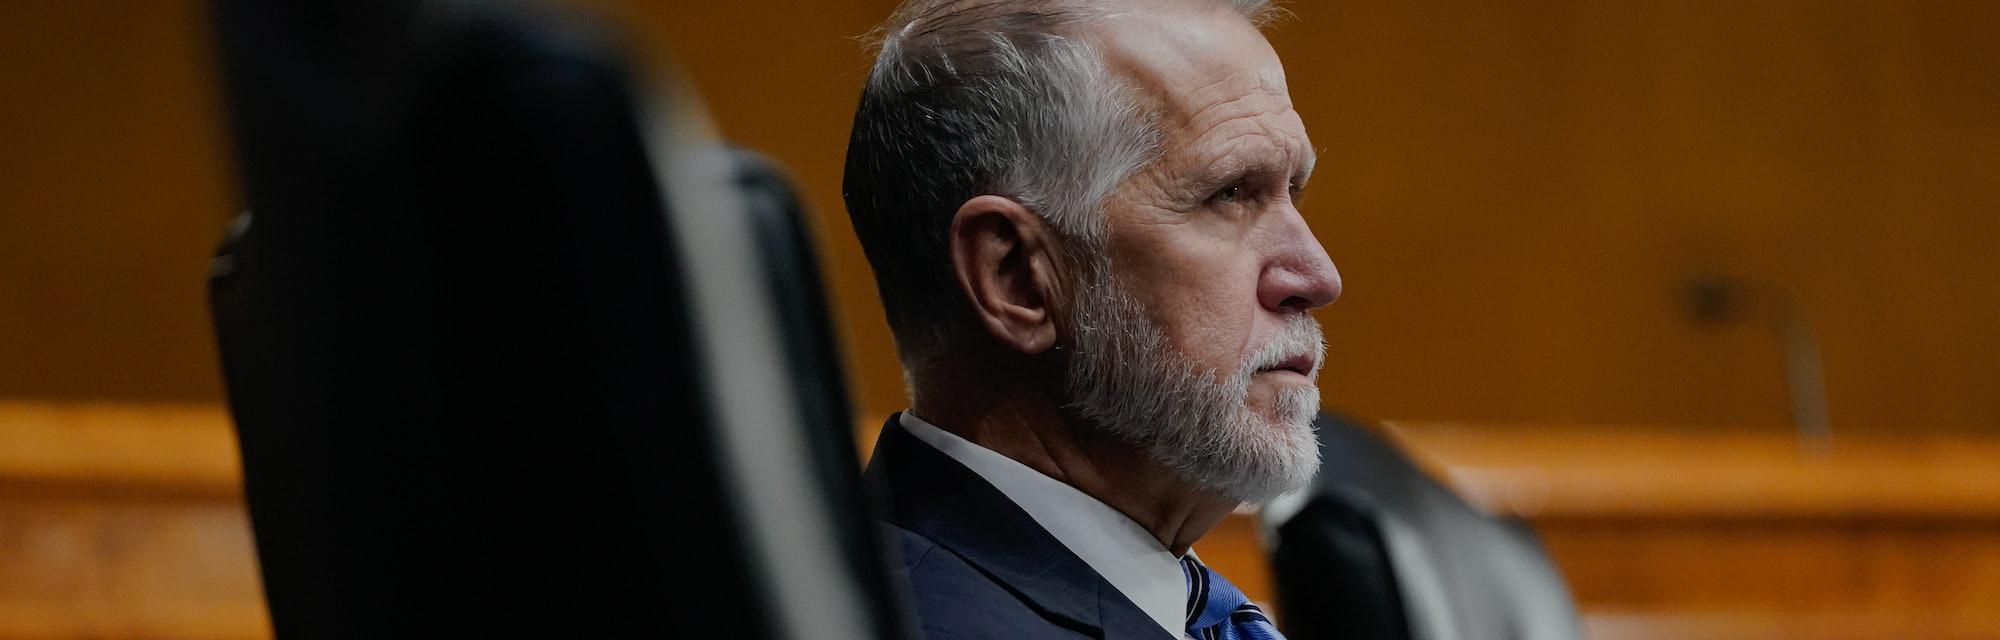 Thom Tillis, U.S. Senator for North Carolina, snuck a Hollywood proposal into the COVID-19 spending bill.